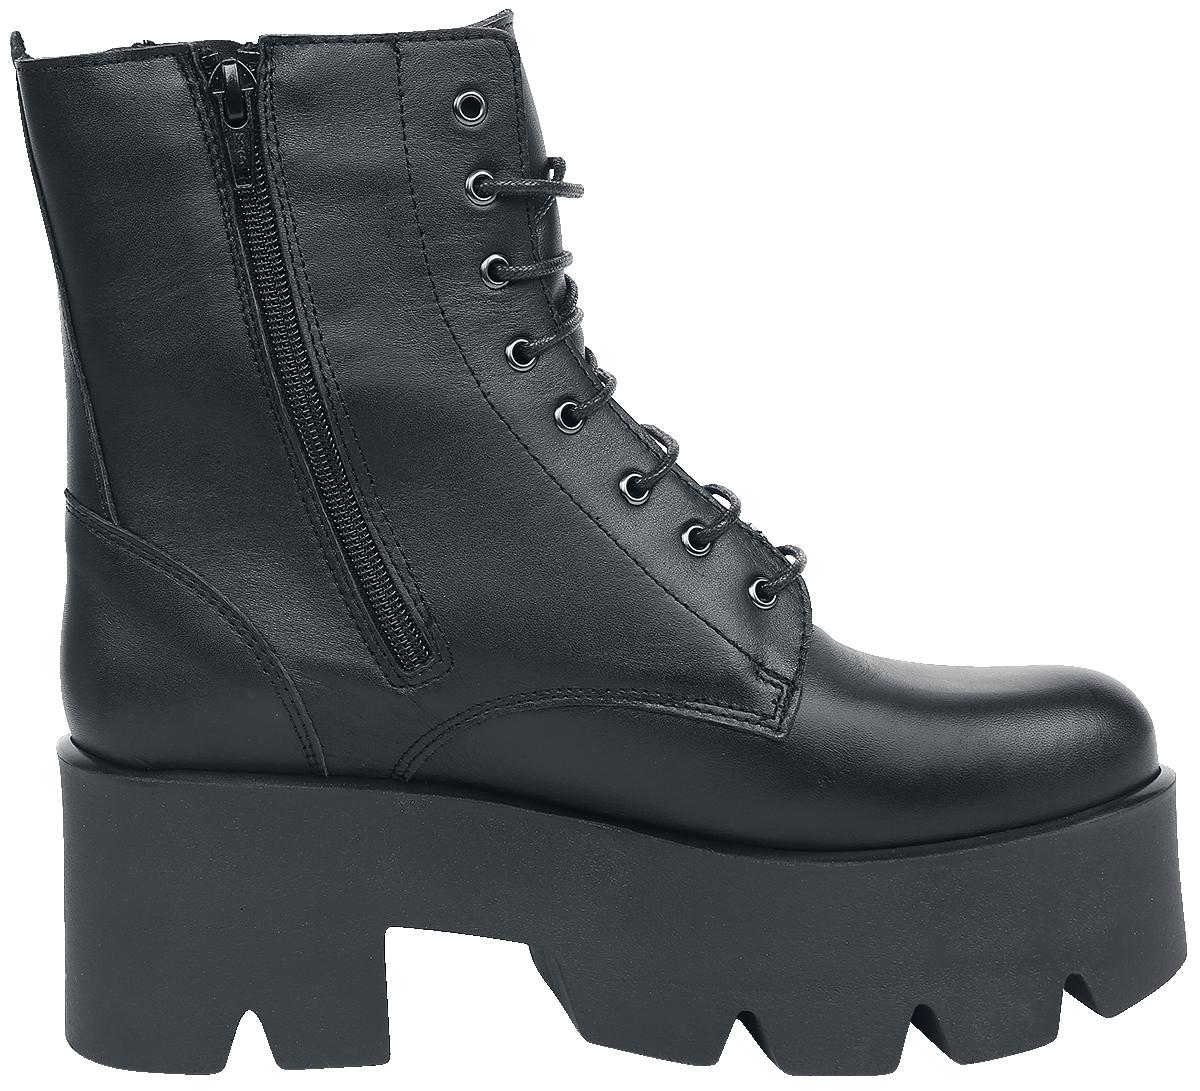 Image of Altercore Janet Boots schwarz